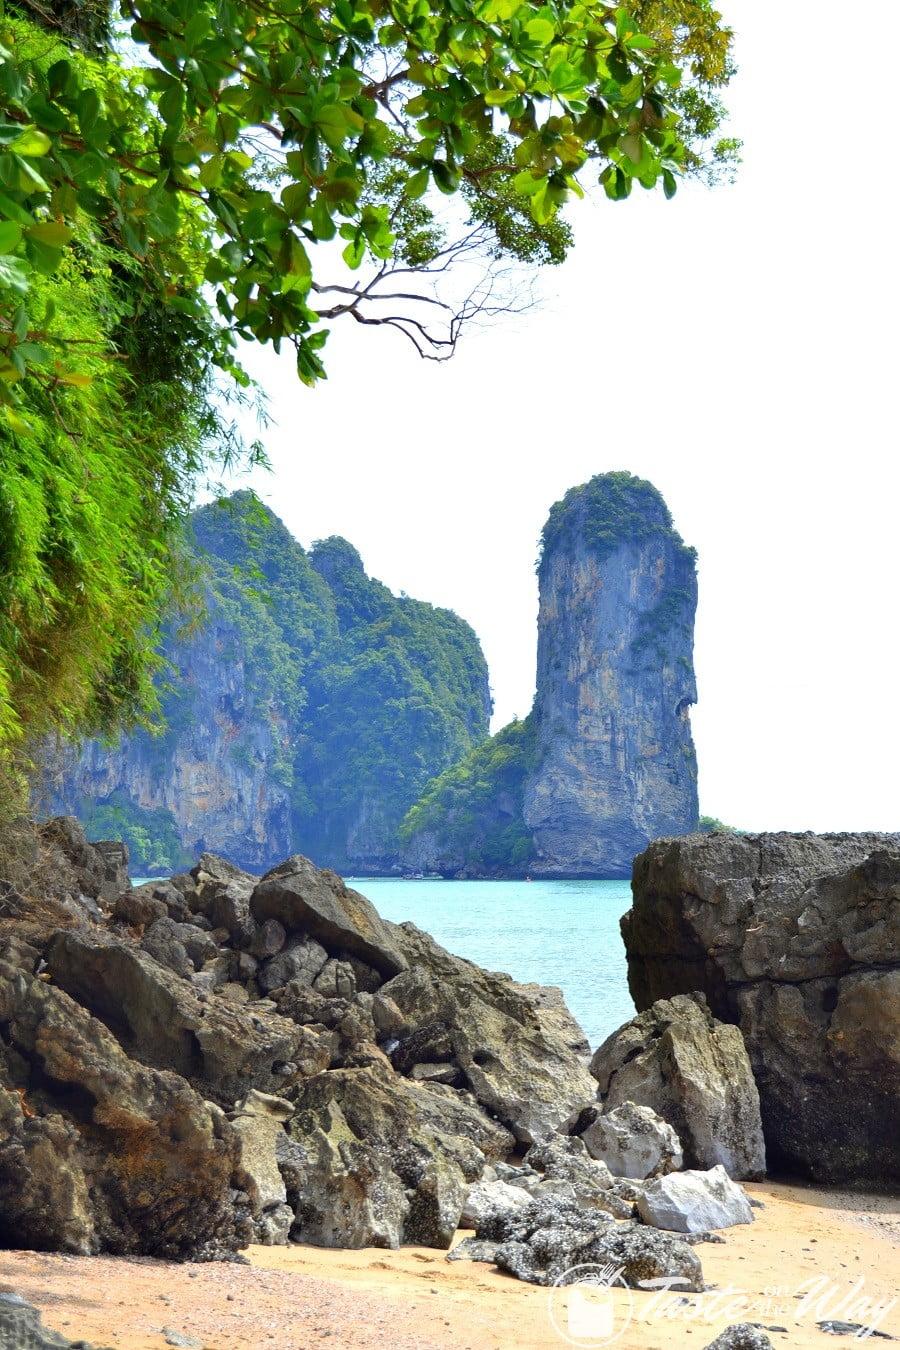 Railey Beach in Ao Nang, Krabi #Thailand #travel